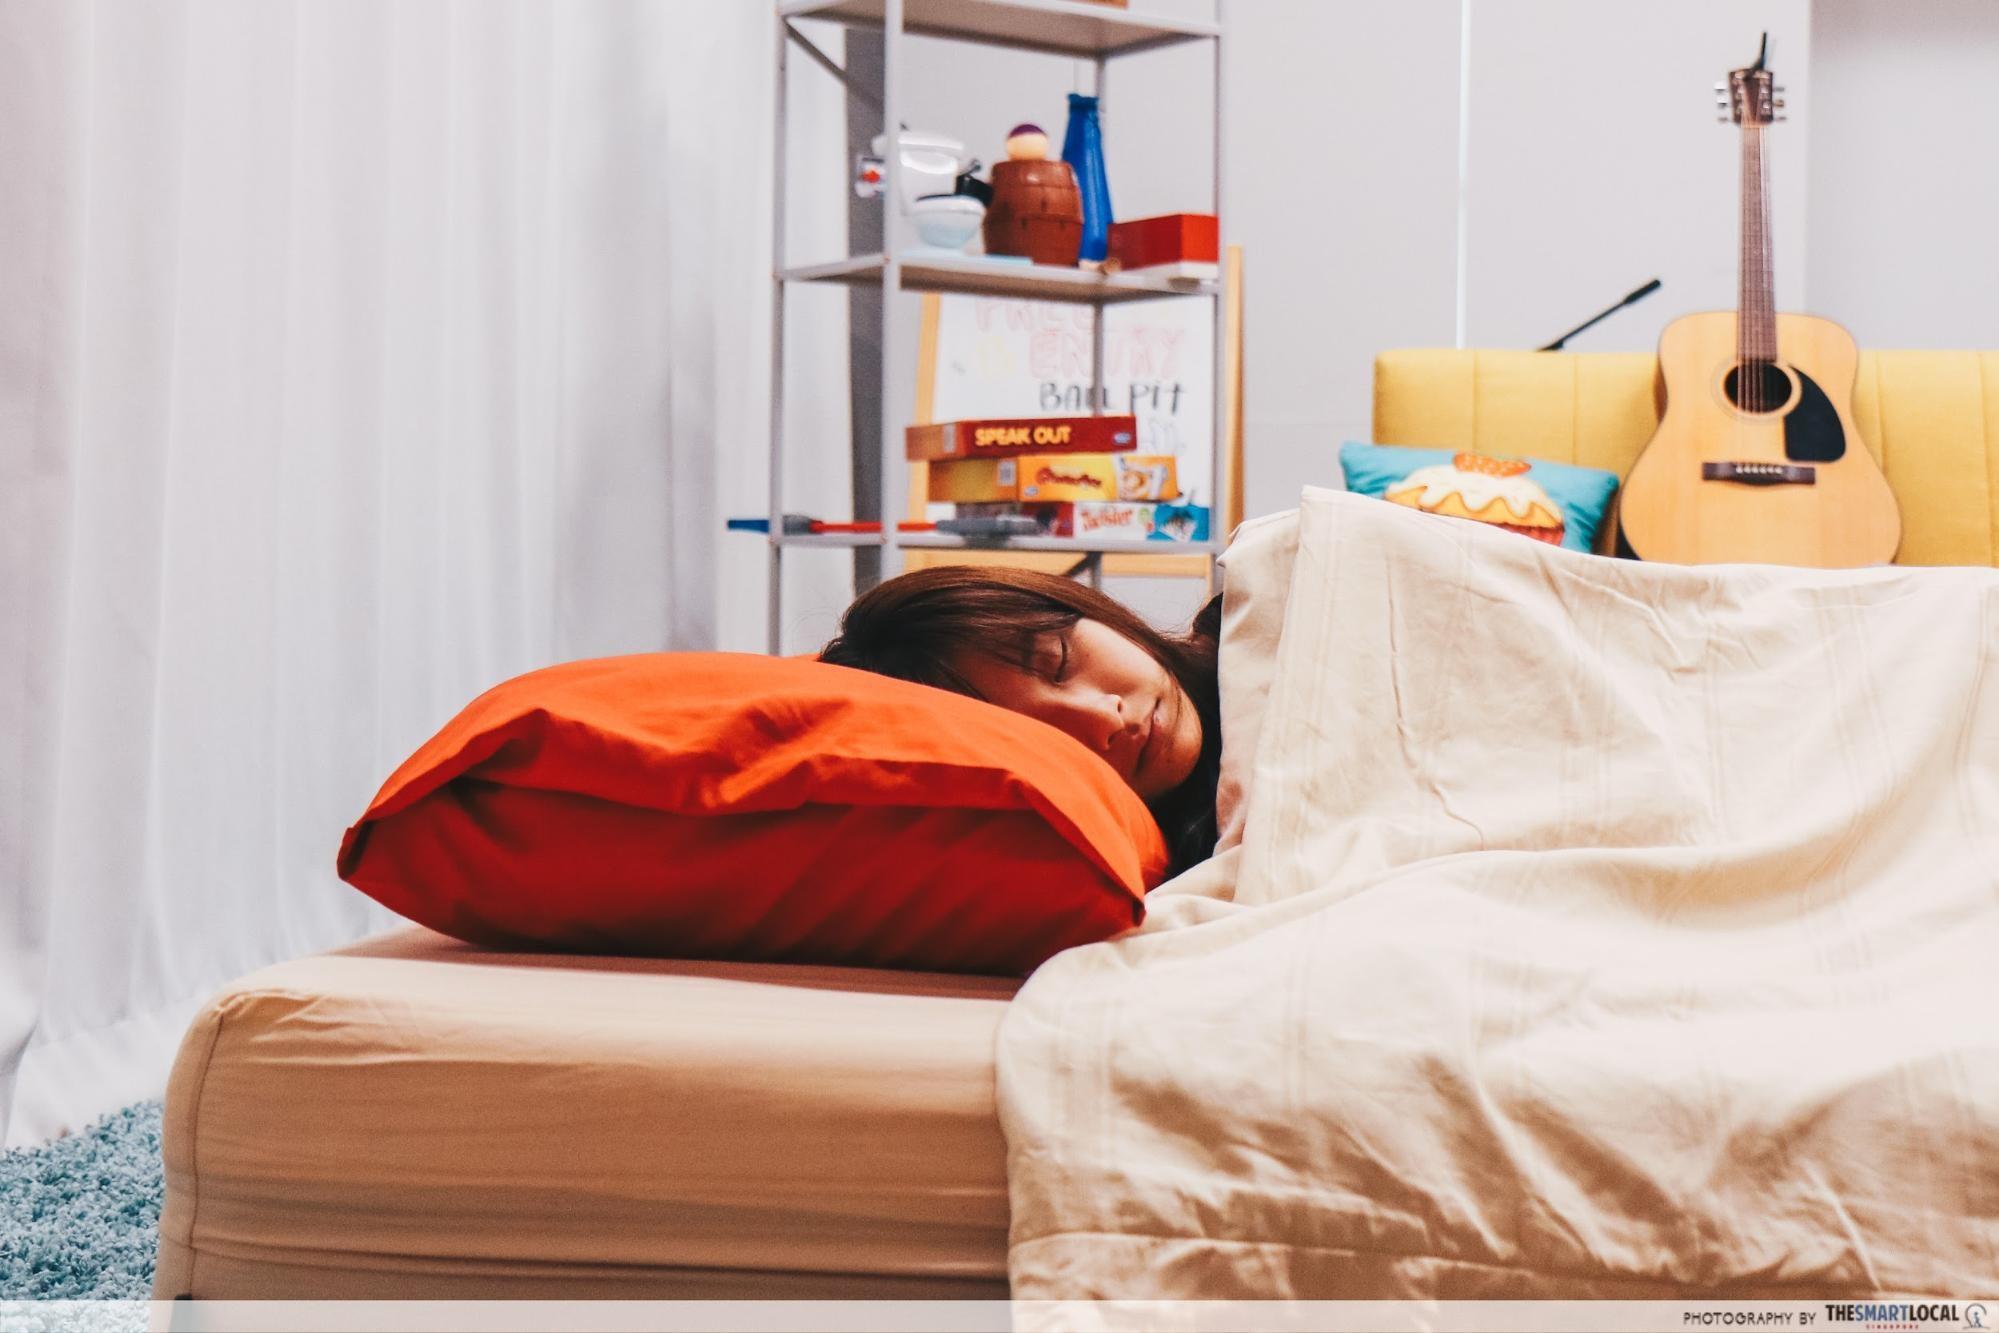 Habits for Hair Loss - Sleep